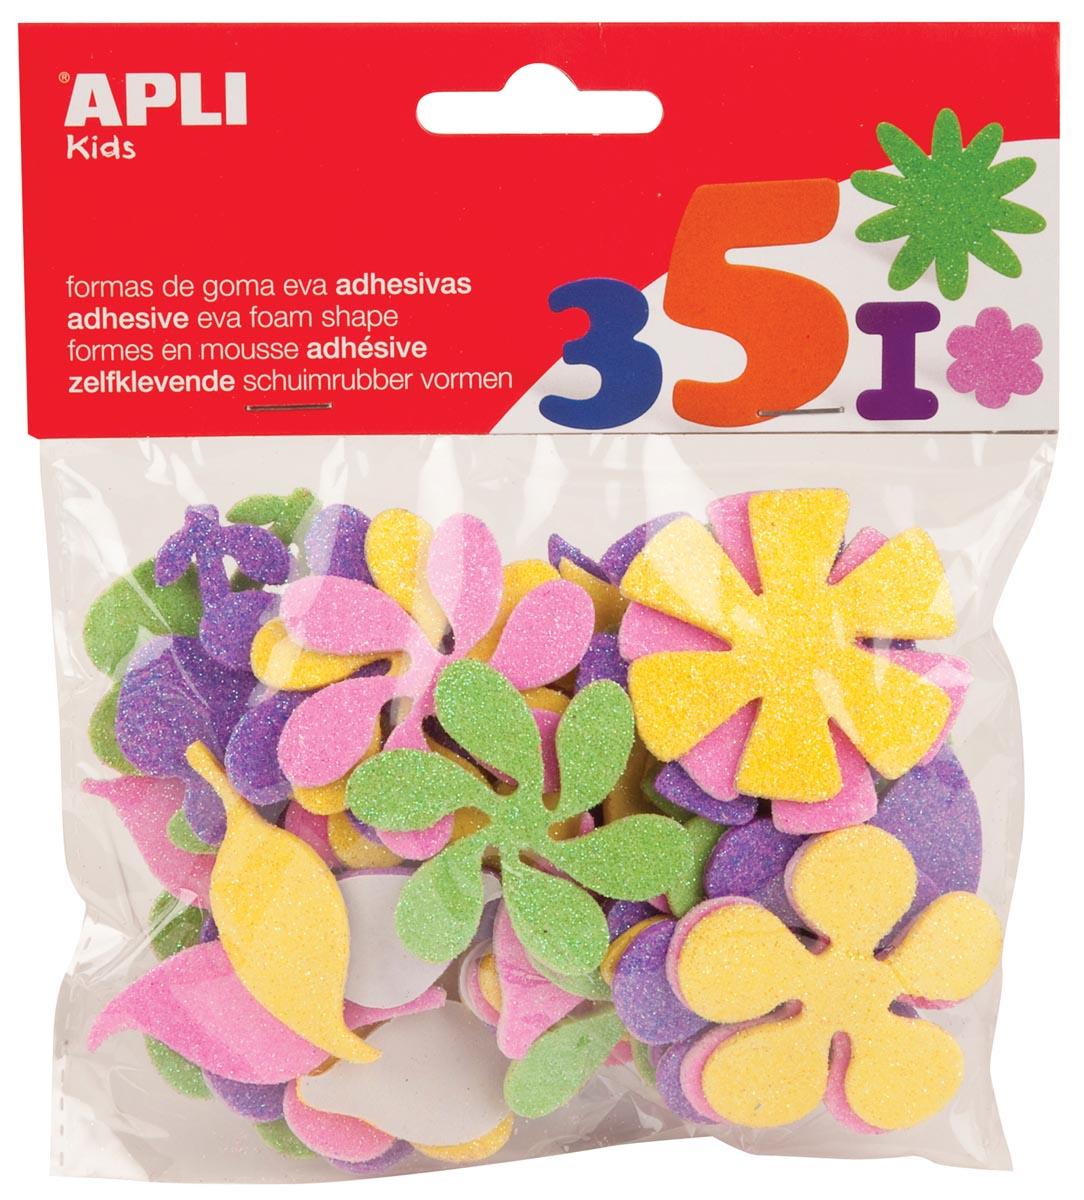 APLI Apli Schuimrubber vormen, 48 stuks (13078)